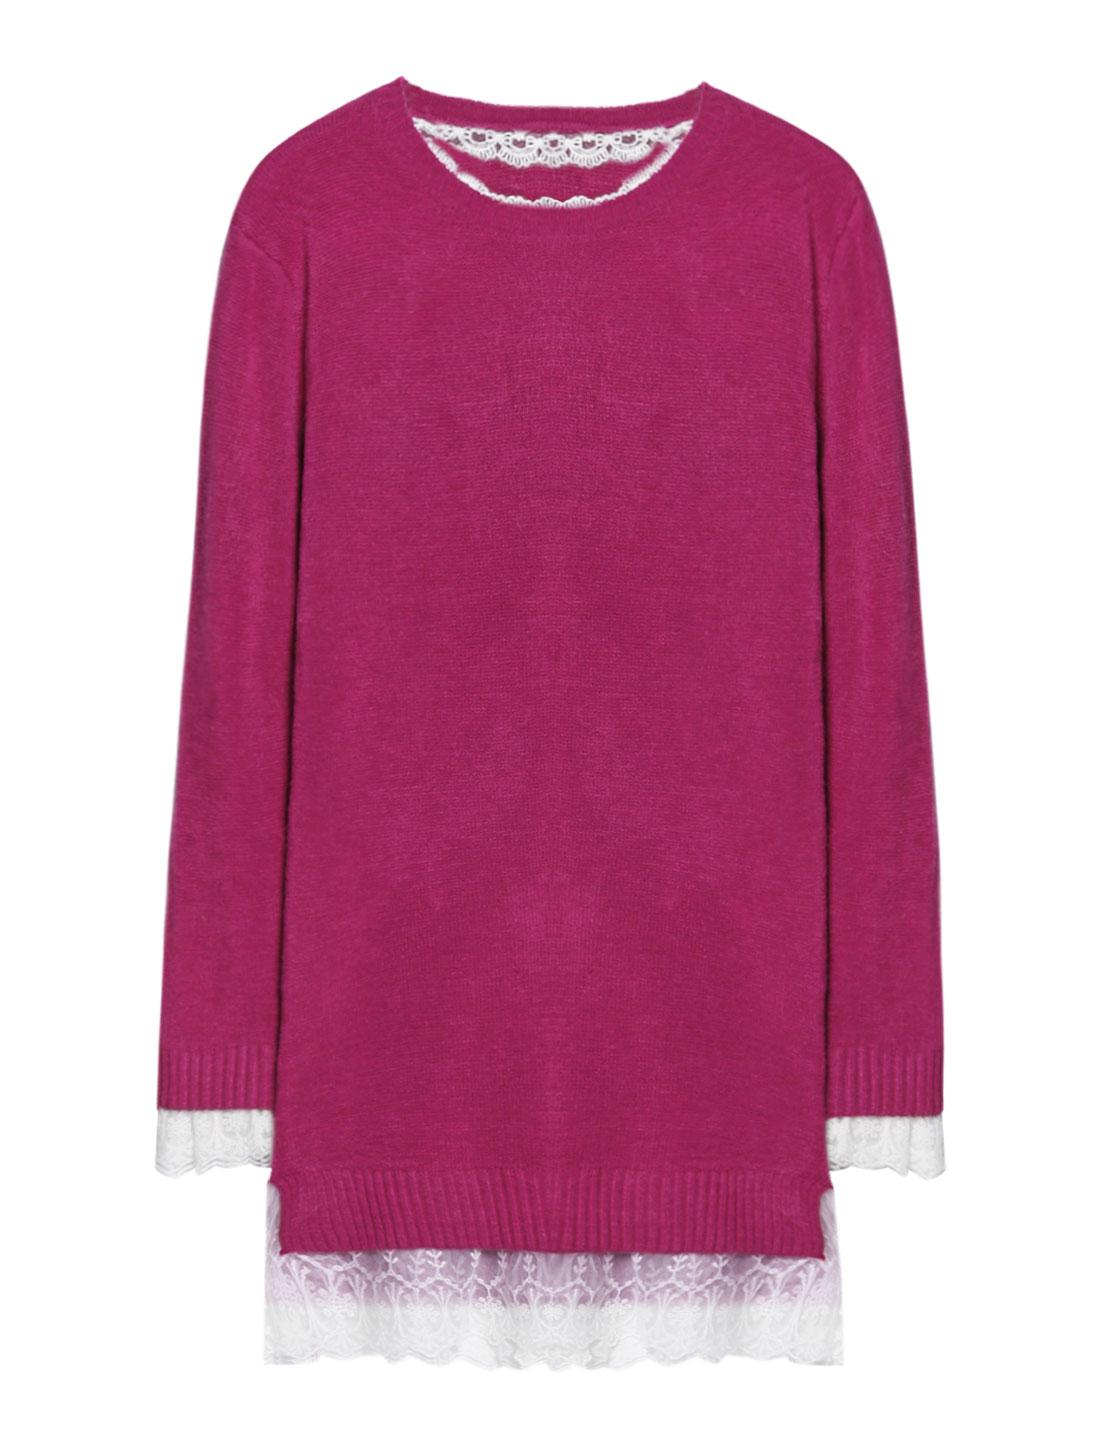 Woman Mesh Crochet Panel Split Sides Tunic Knit Shirt Purple XS